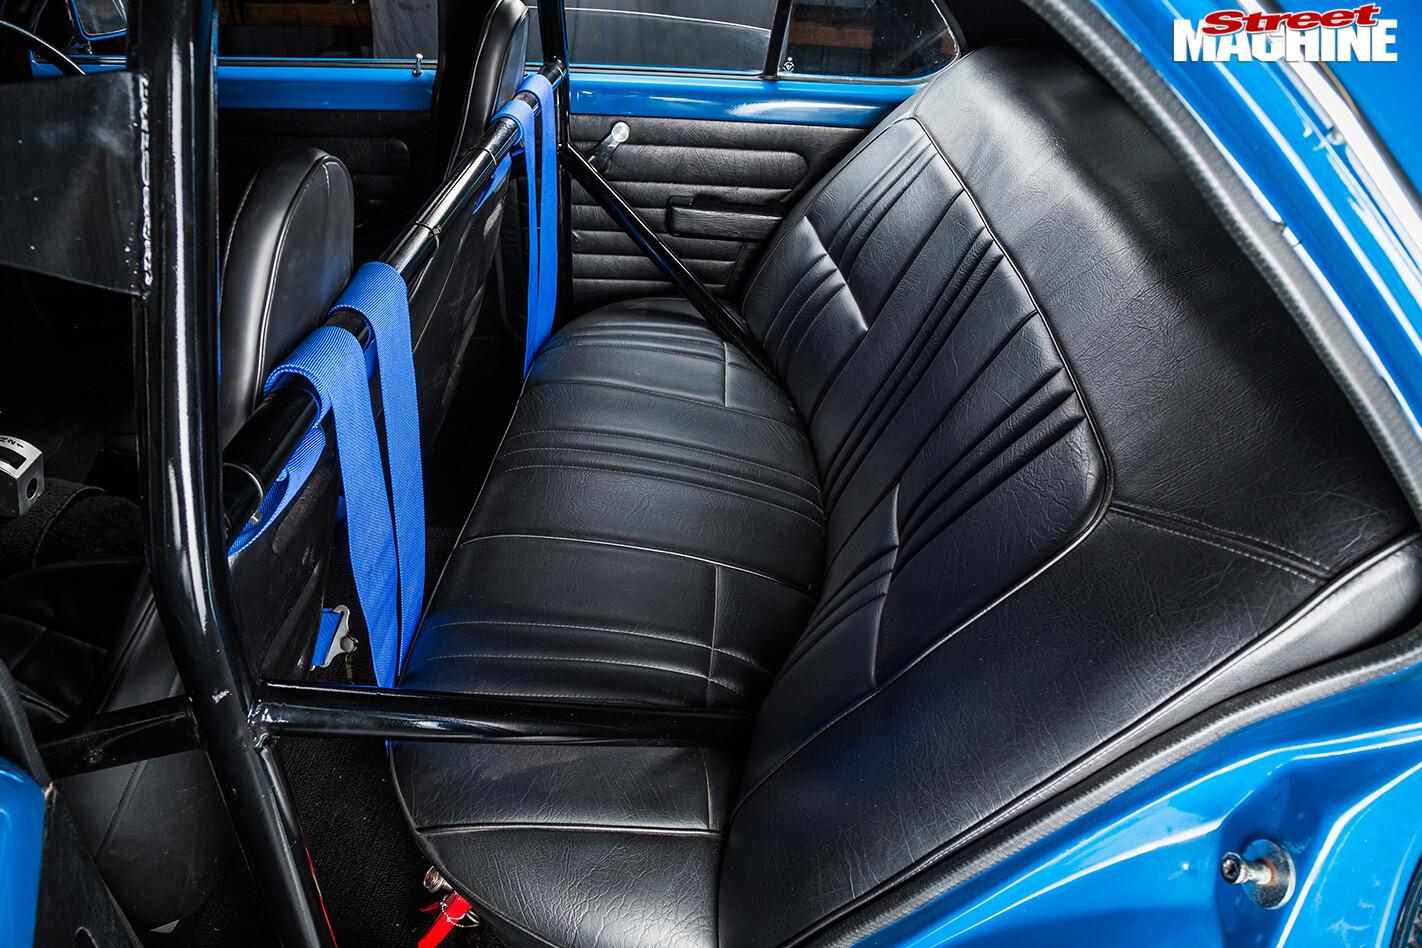 Holden -LH-Torana -seats -rear